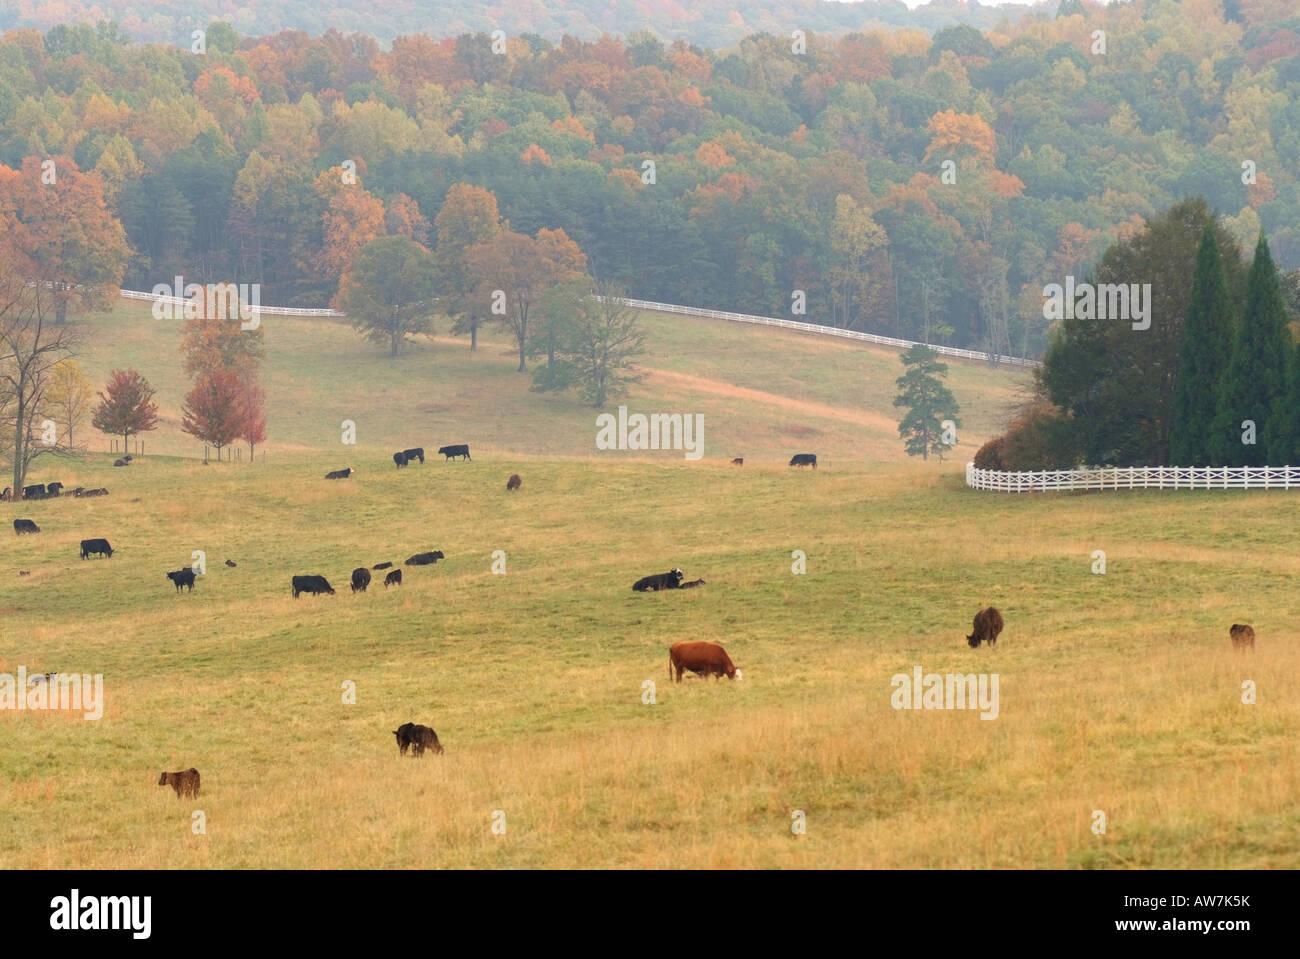 USA Gordonsville VA Cows graze in a pastoral autumn scene near Gordonsville VA - Stock Image